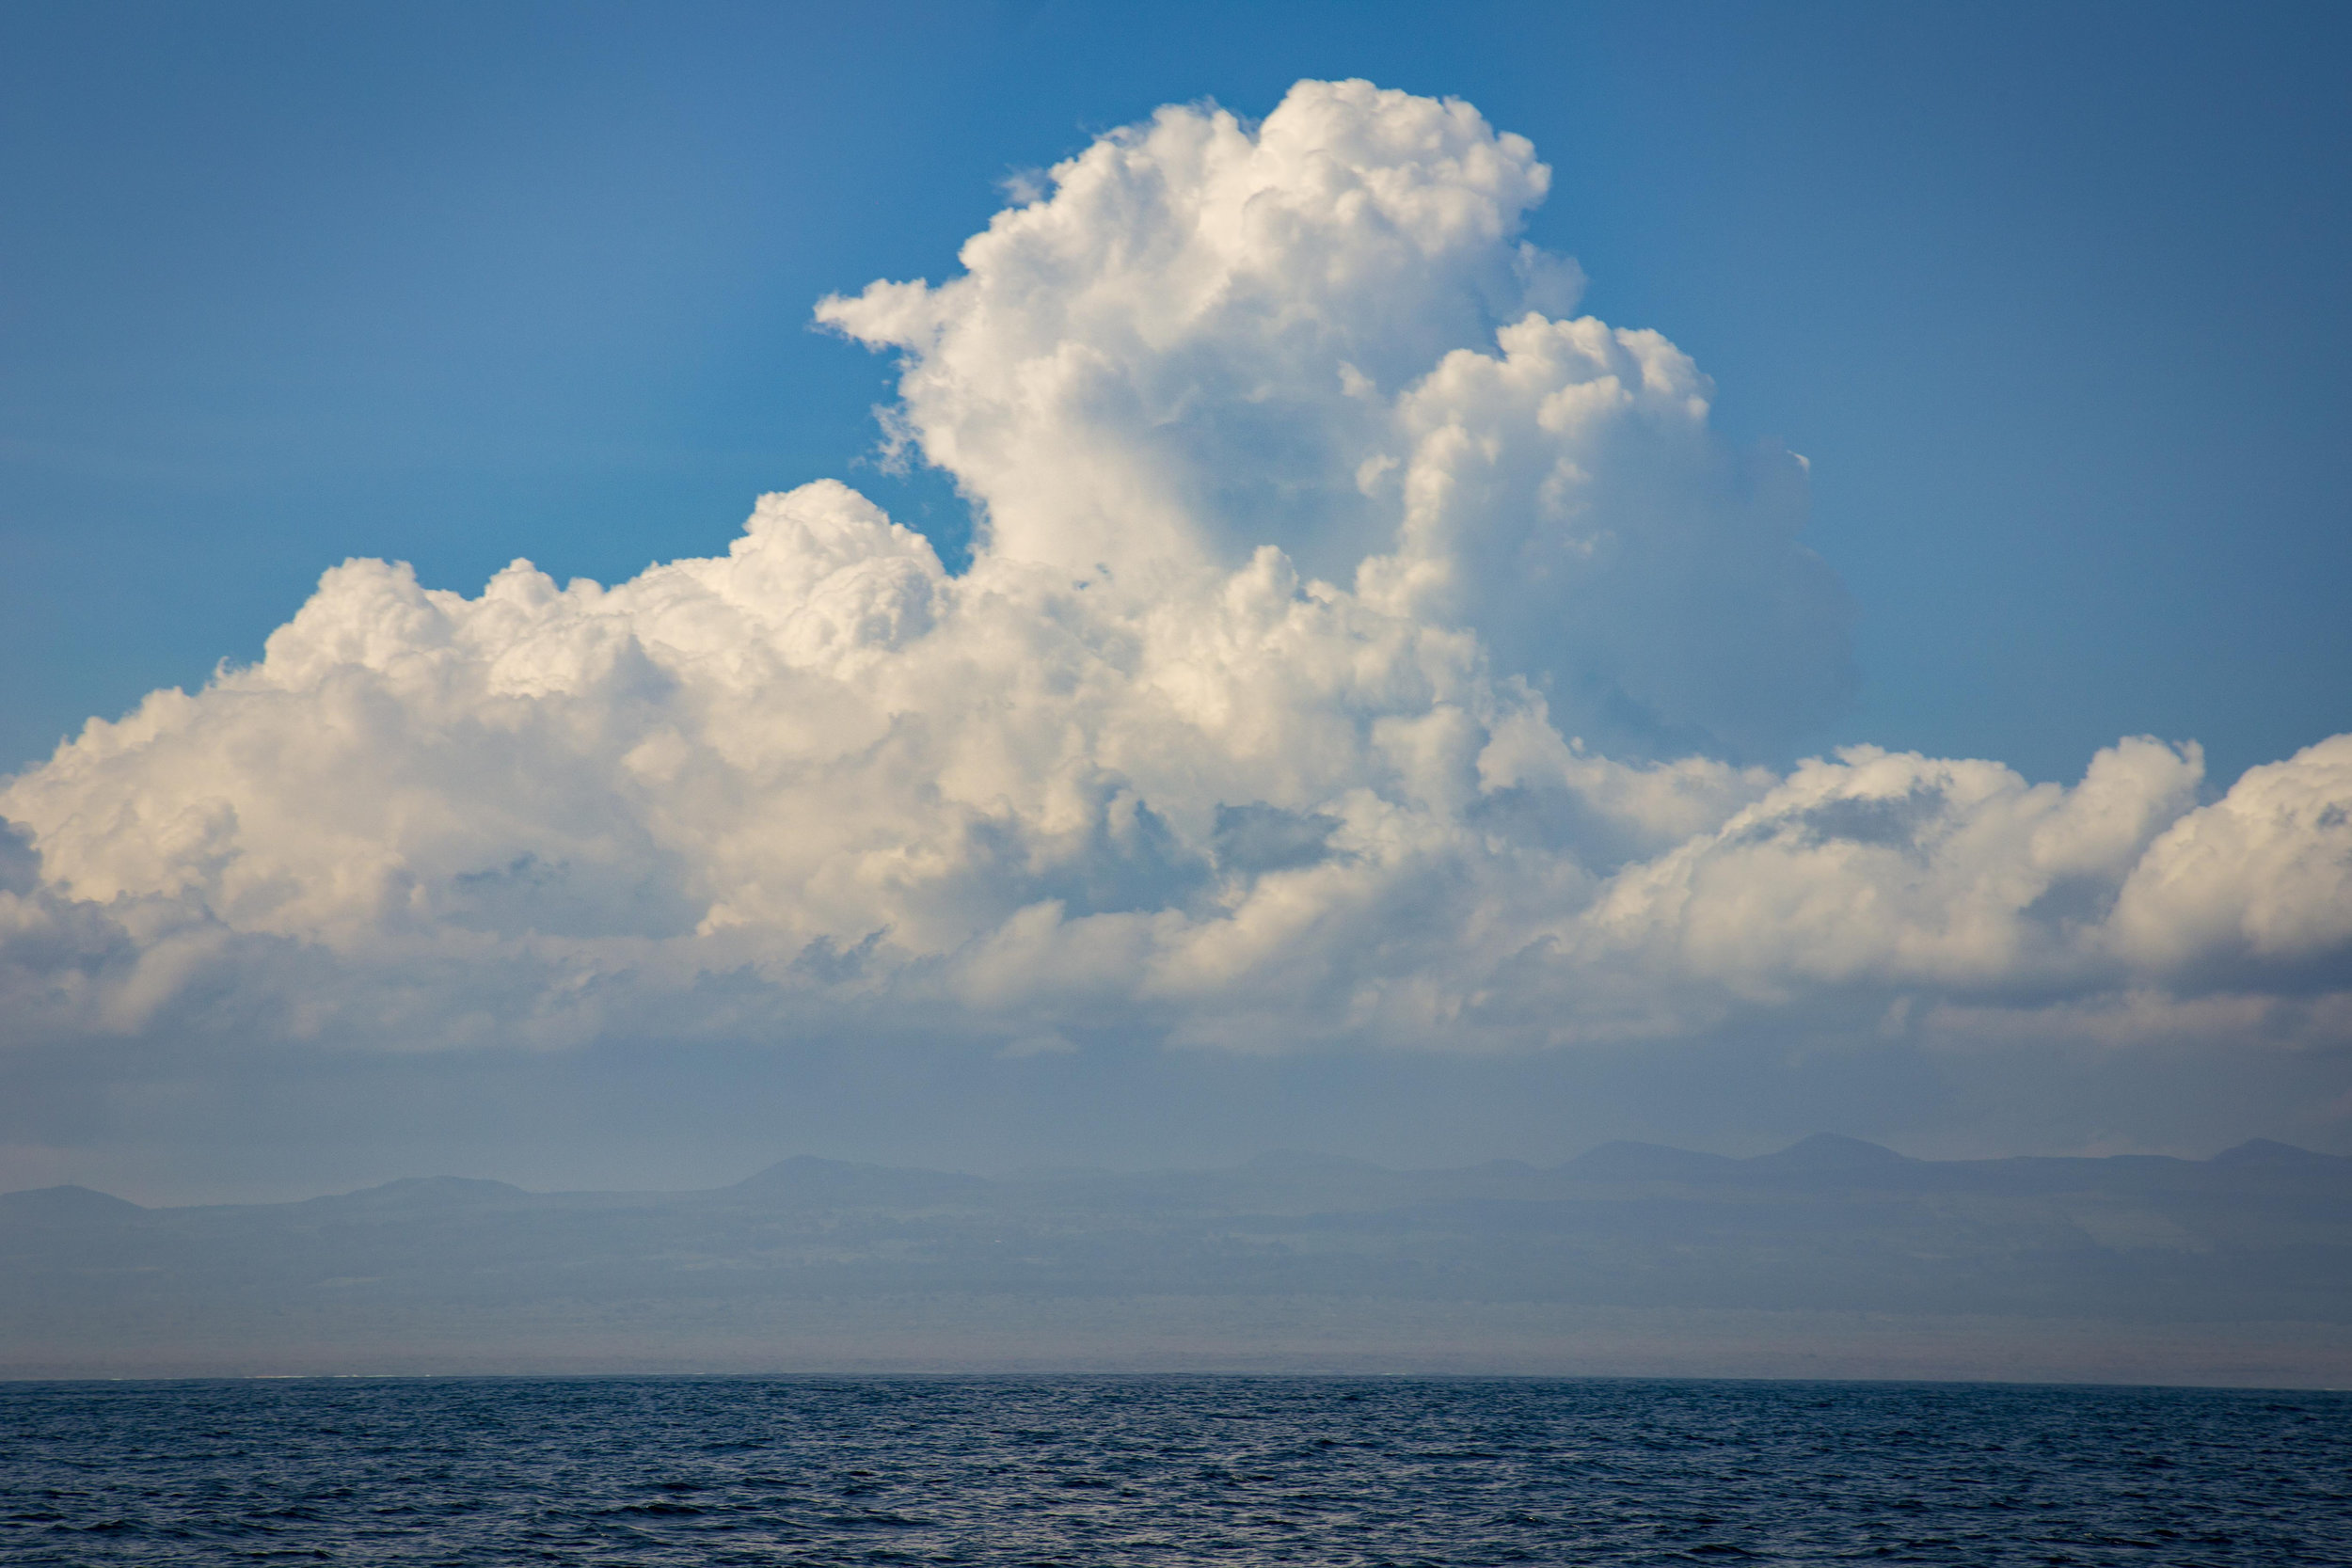 Galopogos Clouds.jpg